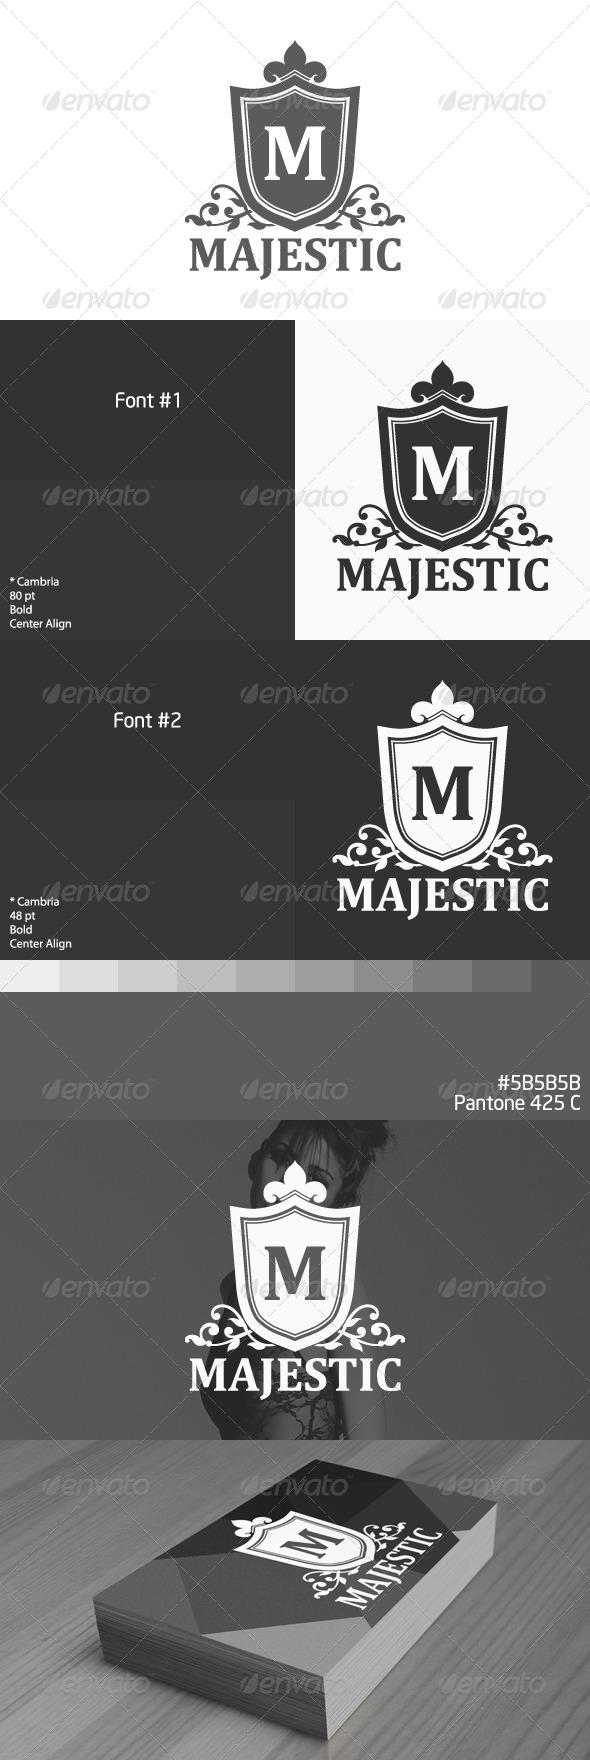 GraphicRiver Majestic Logo 3925959